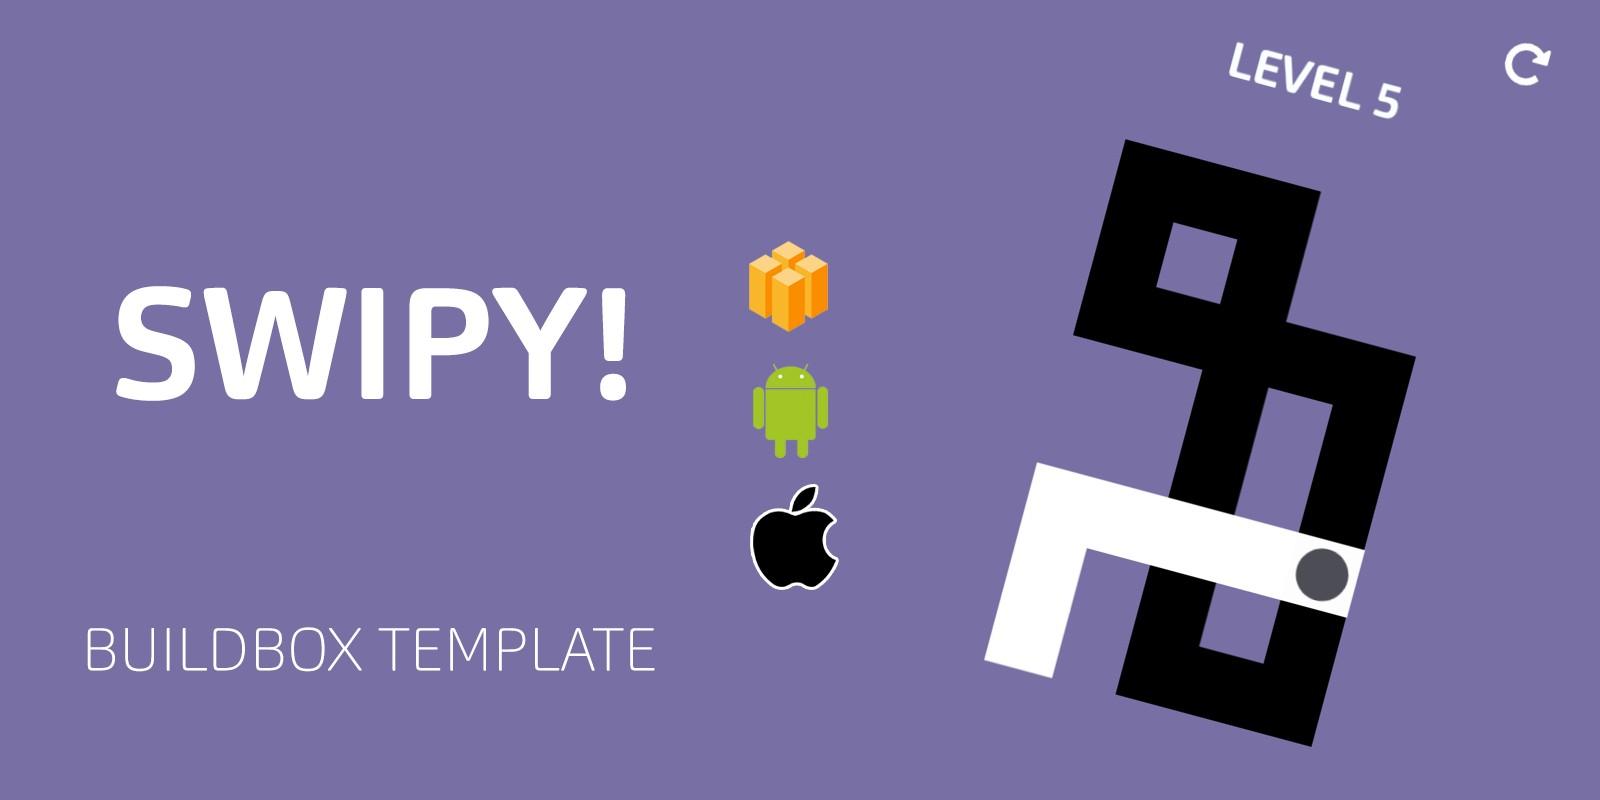 Swipy Buildbox Template